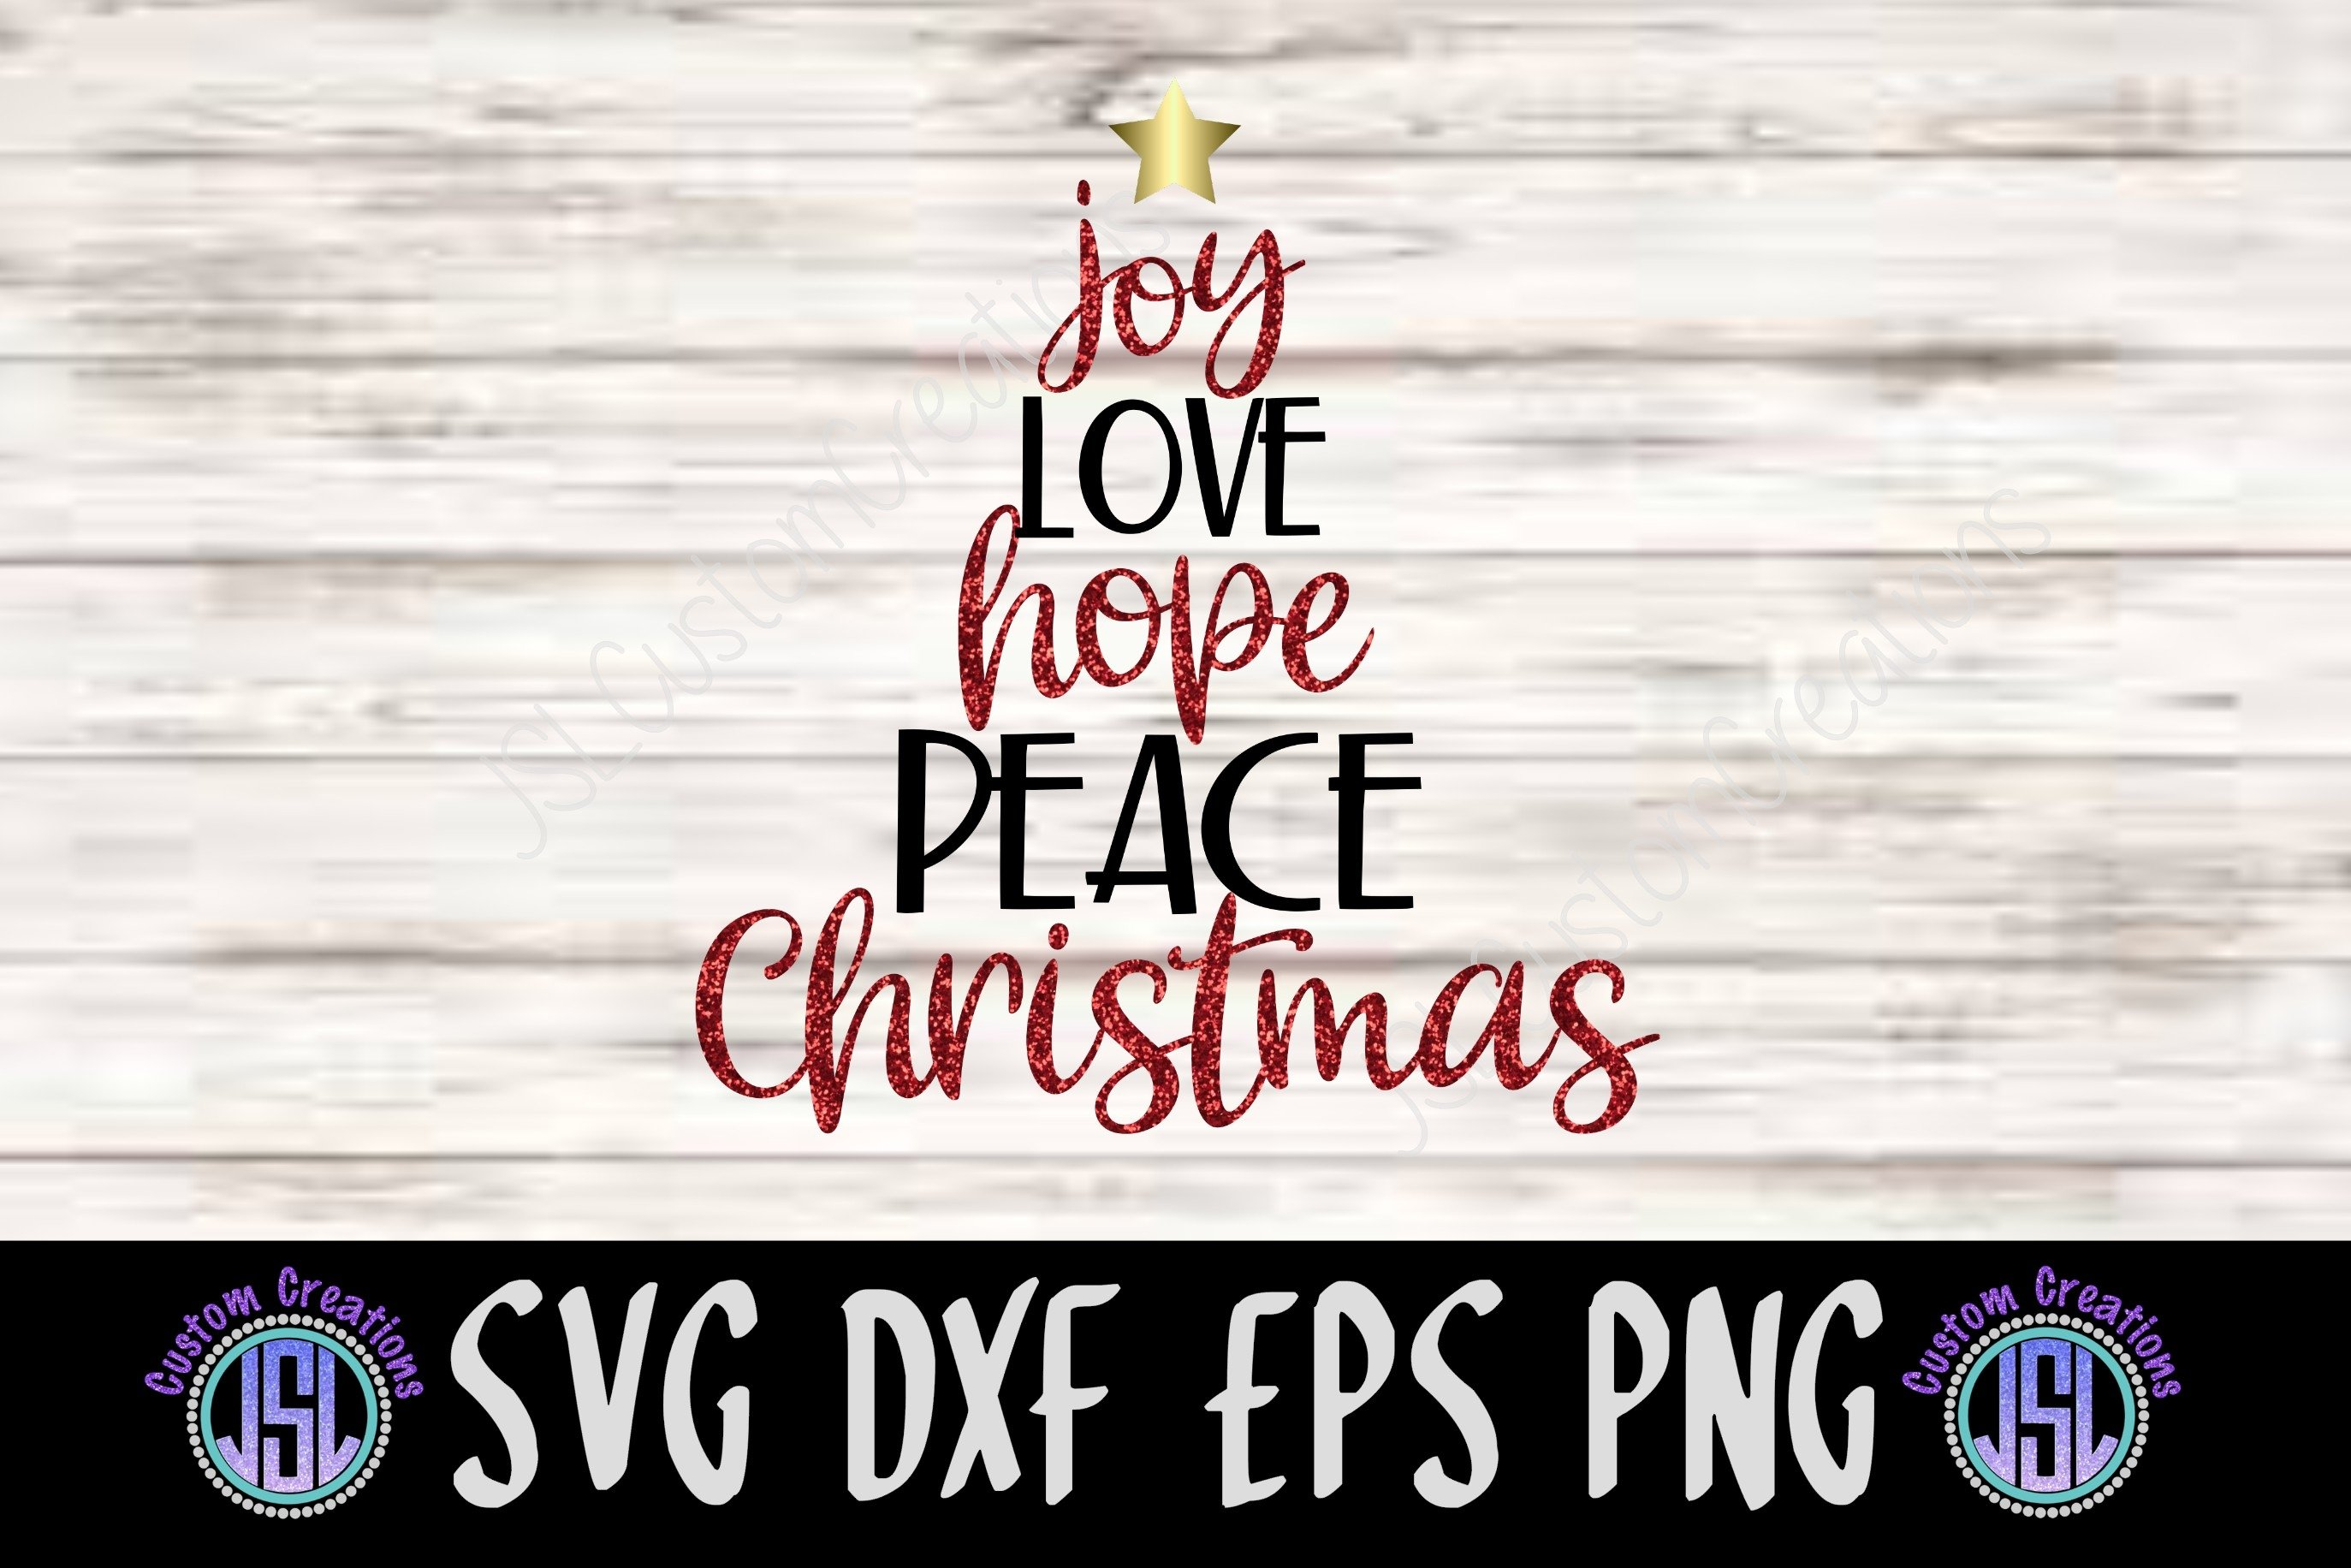 Download Love Peace Joy Christmas Svg, Dxf Files, Png Files, Holidays Svg, Xmas Svg Image